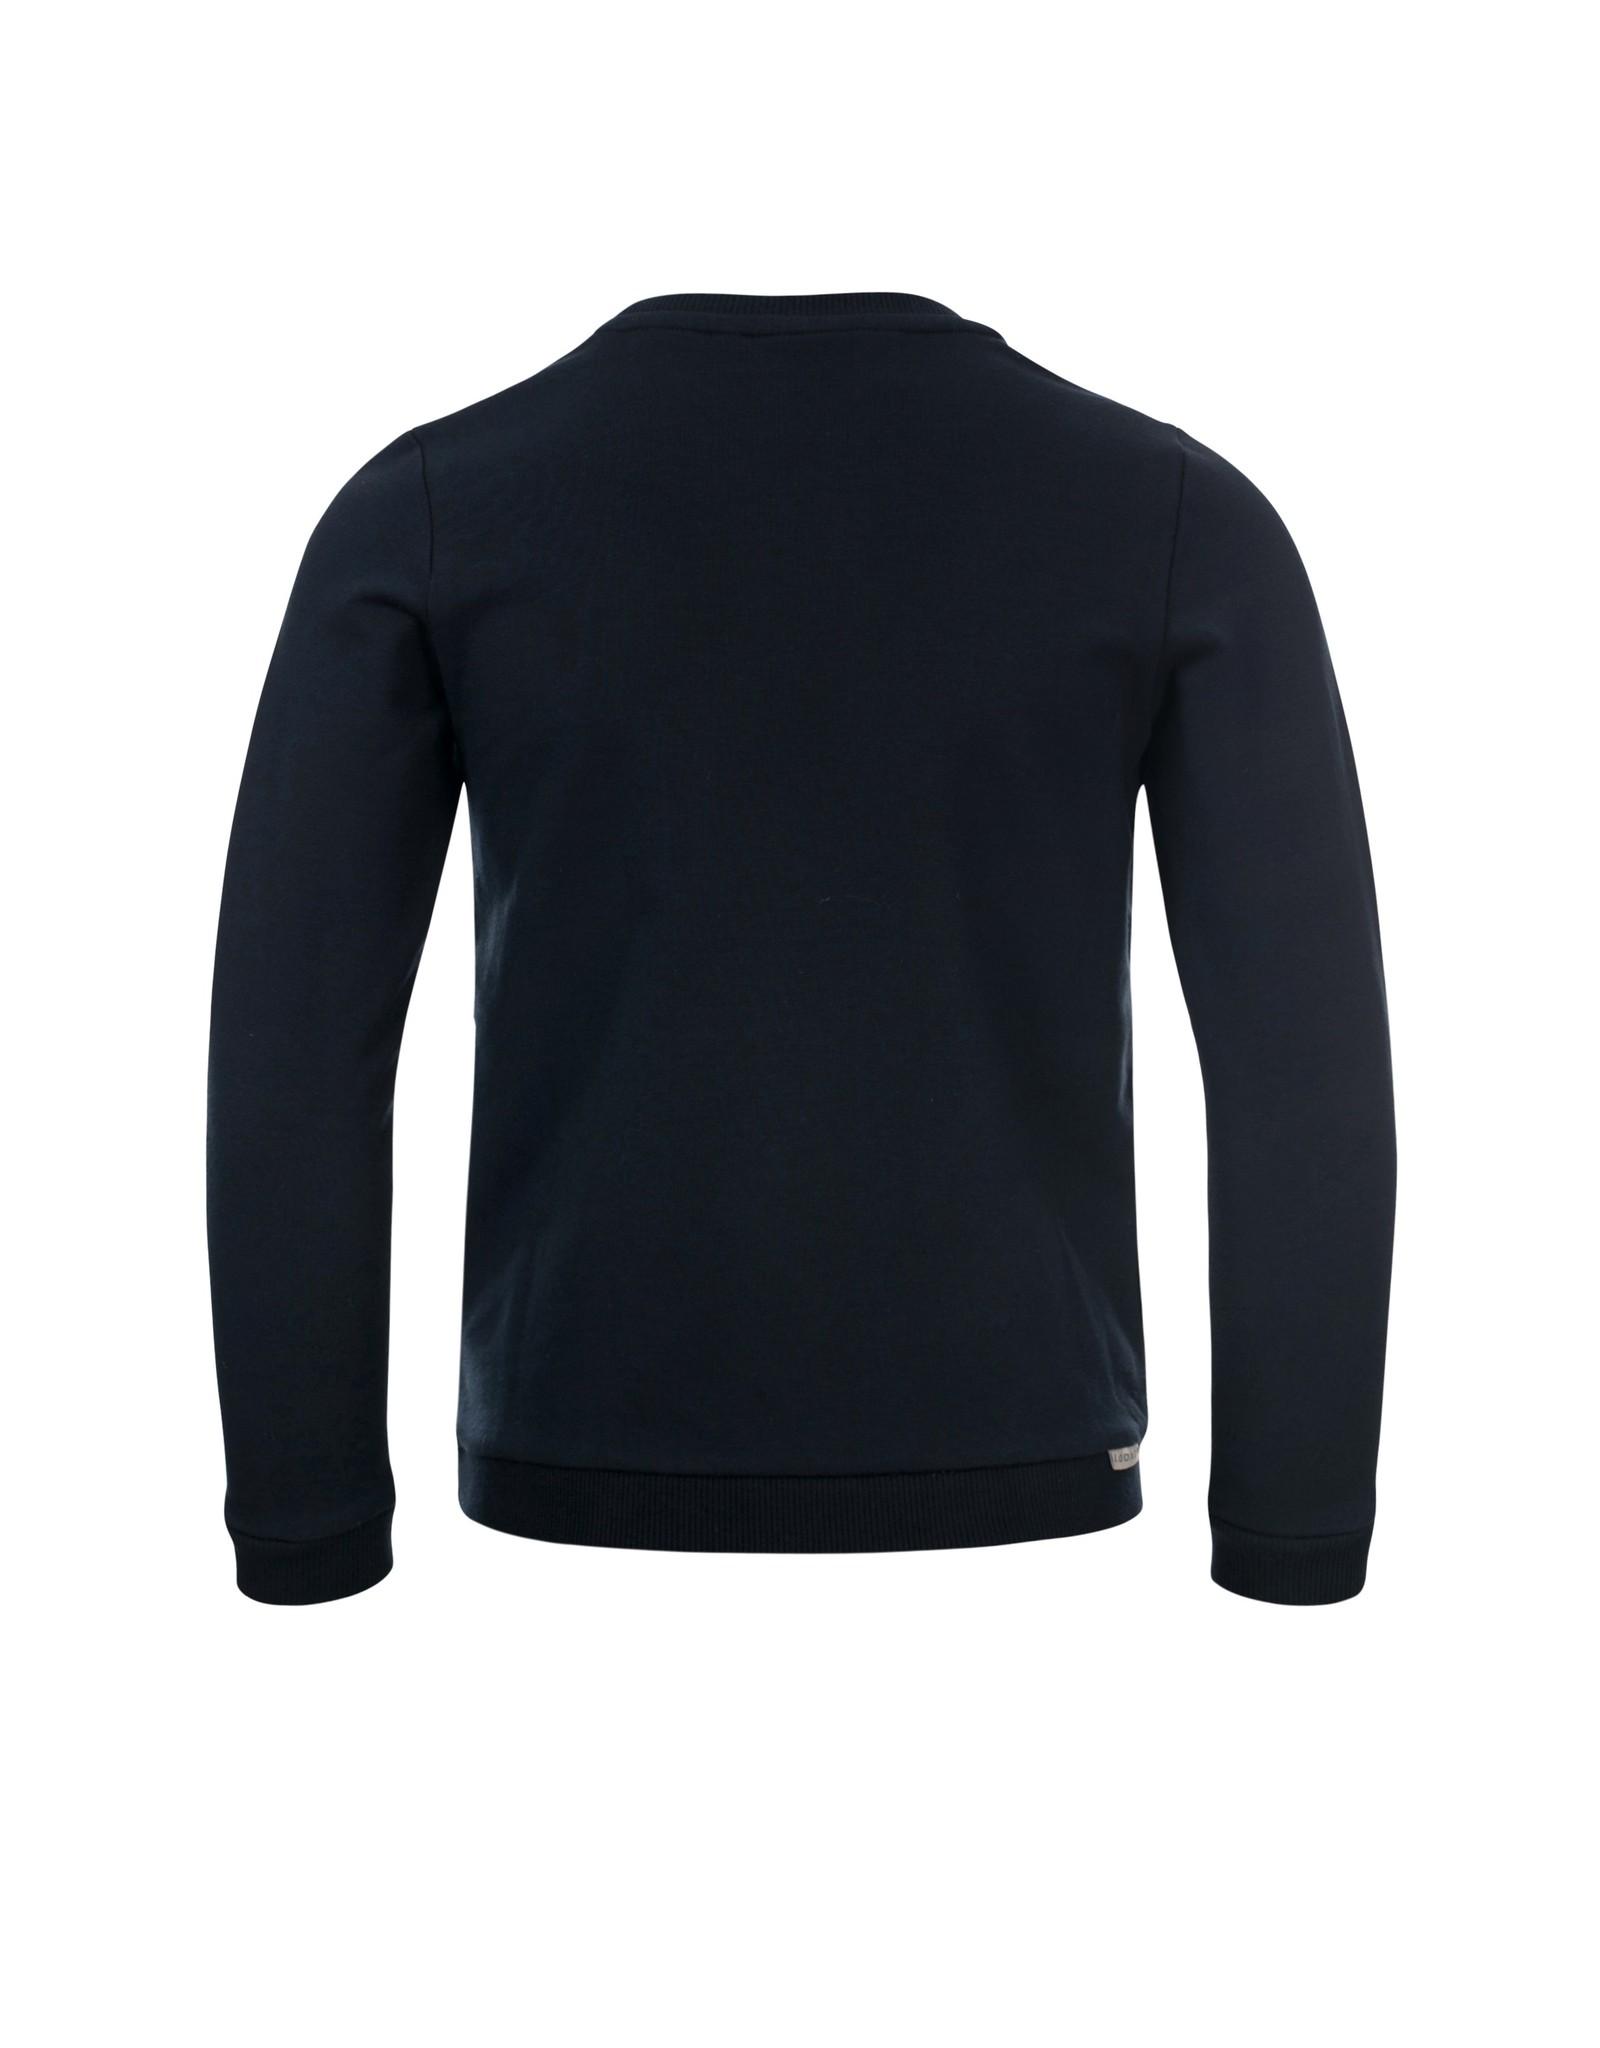 Looxs Little Little sweater navy